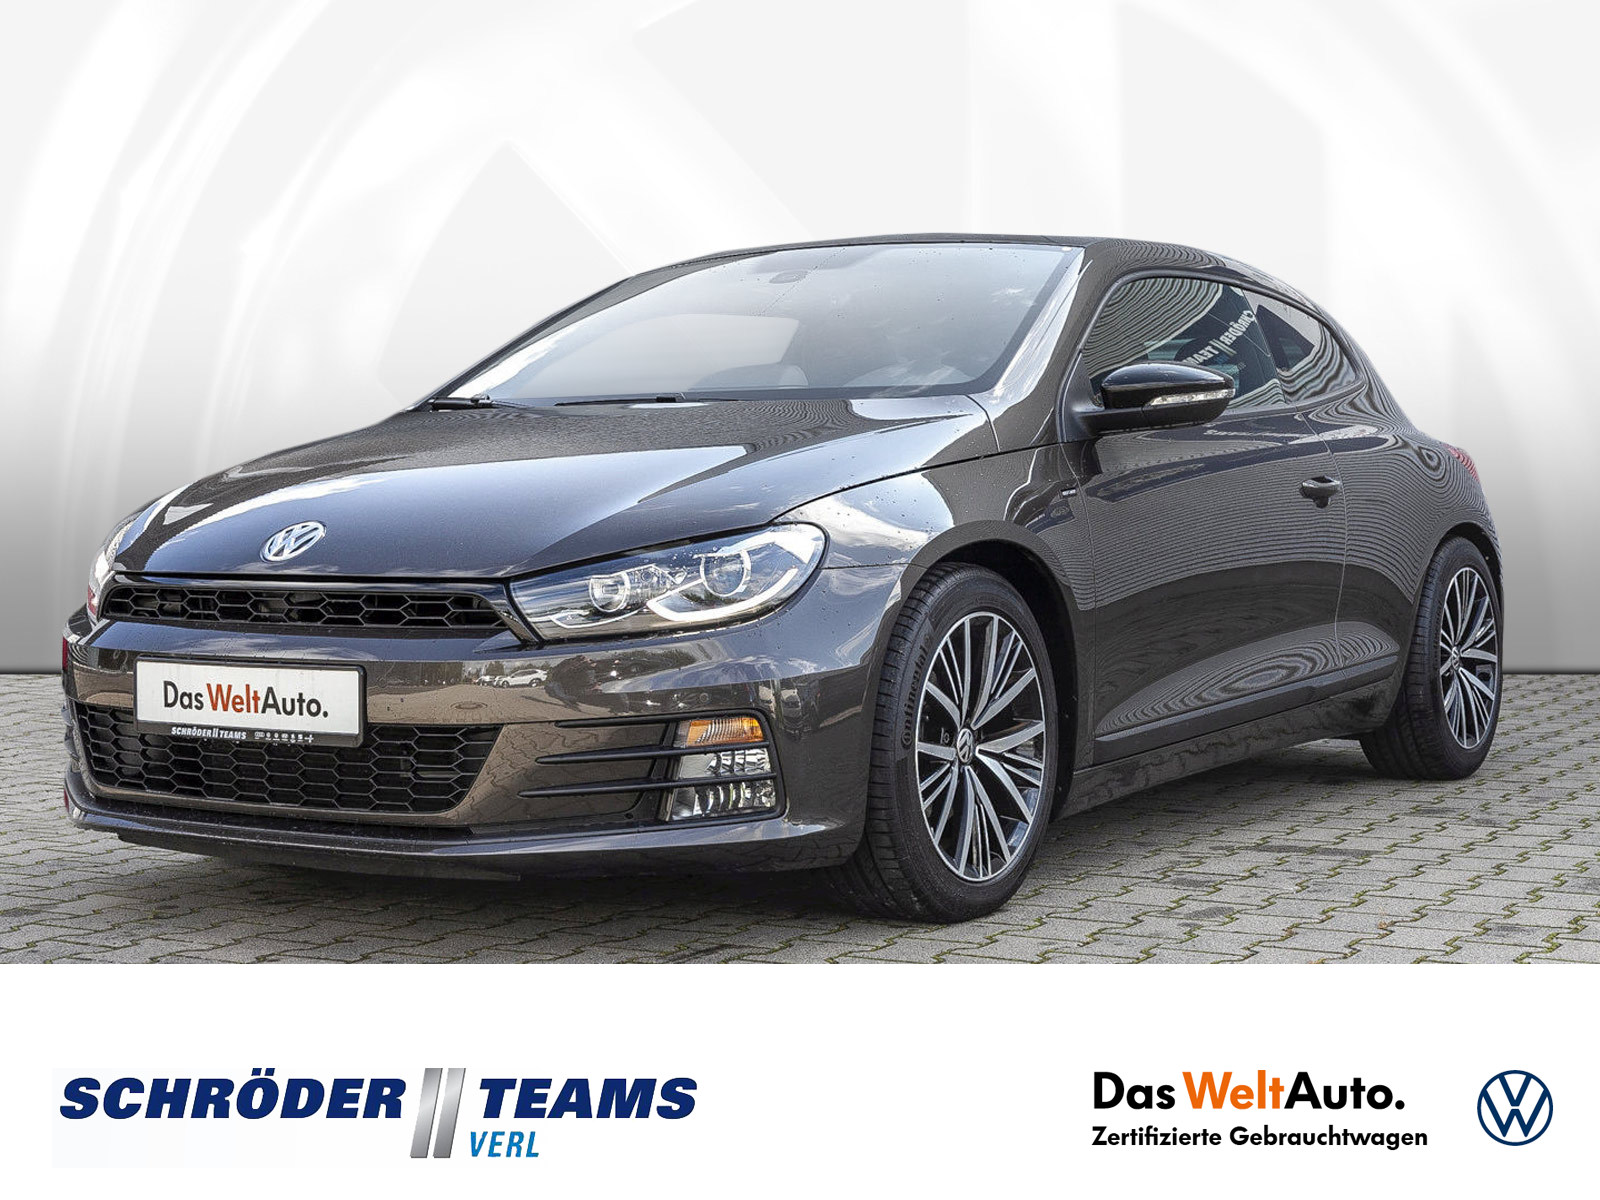 Volkswagen Scirocco 1.4 TSI Allstar Pano*XEN*NAV, Jahr 2017, Benzin